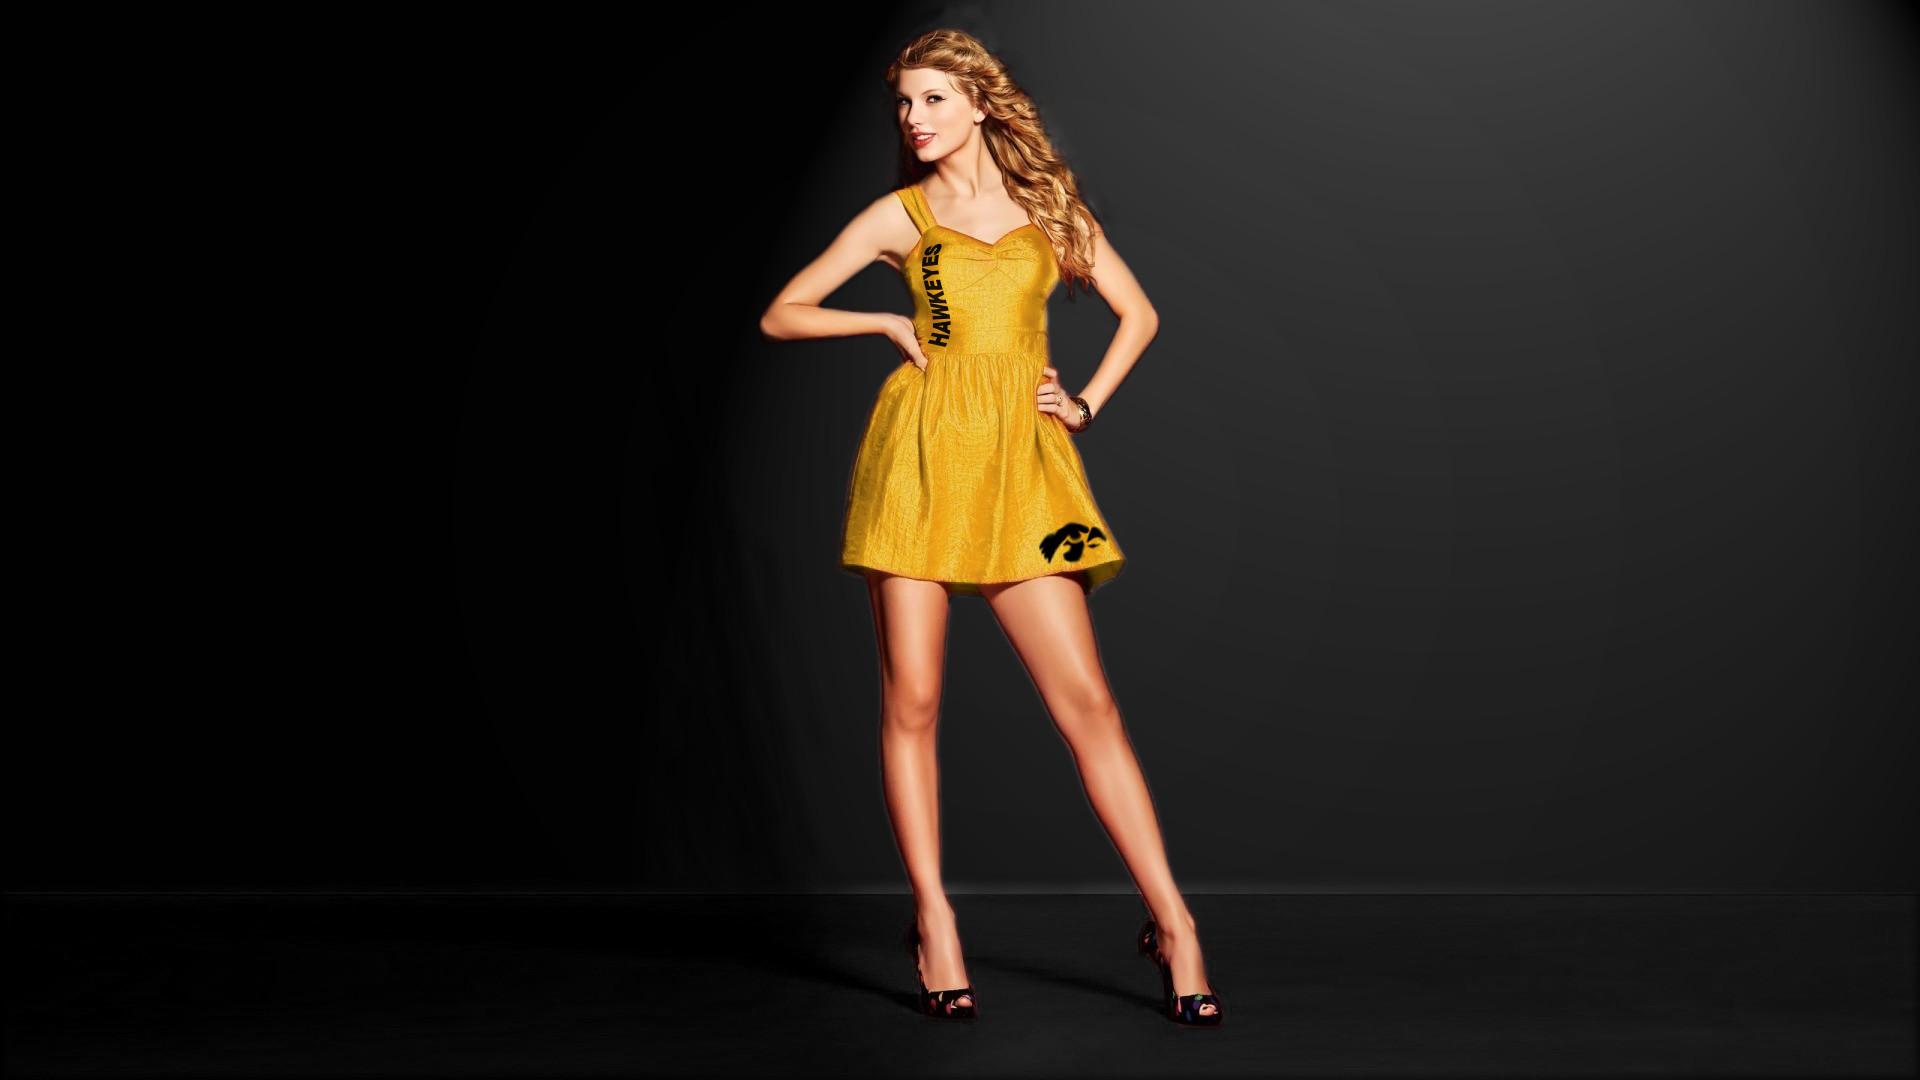 … Taylor Swift – Iowa Hawkeye Dress by pianoman674